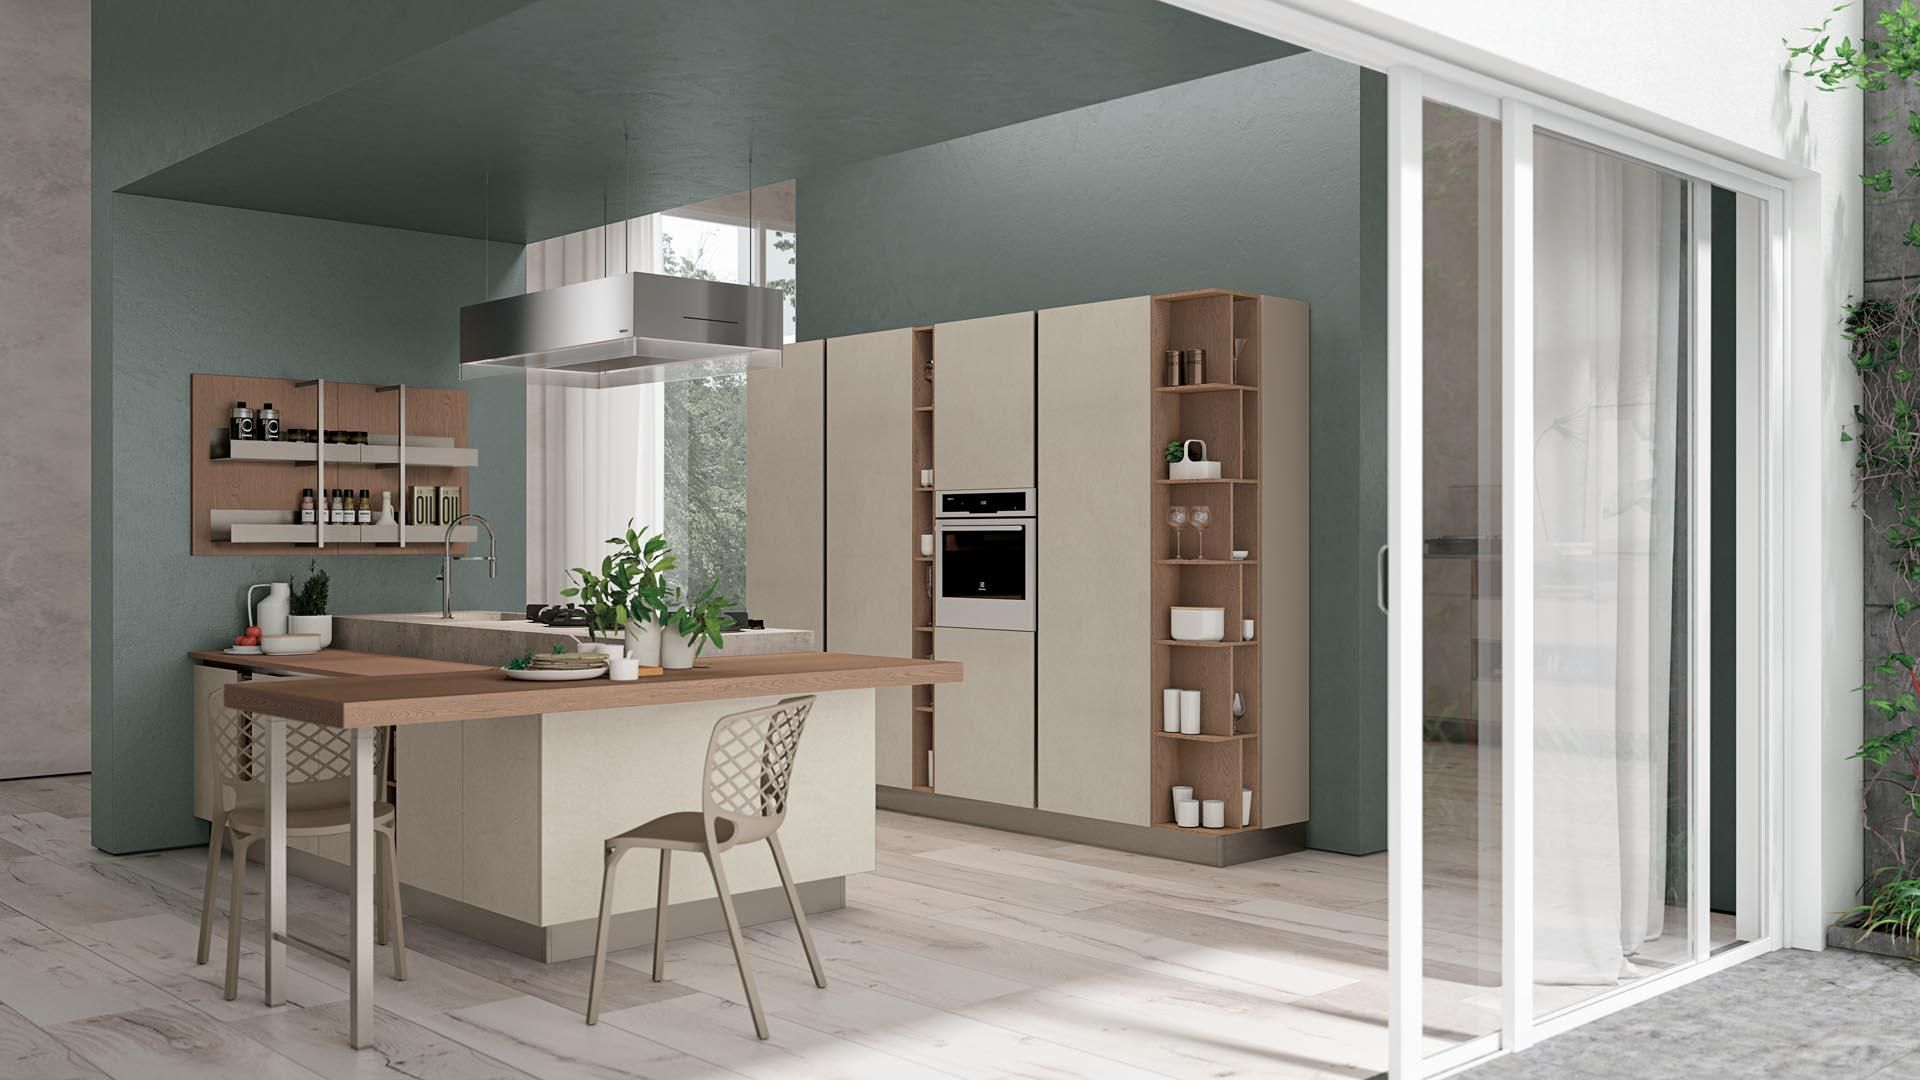 Clover Lux Cucine Lube Cucine Moderne Arredo Interni Cucina Cucine